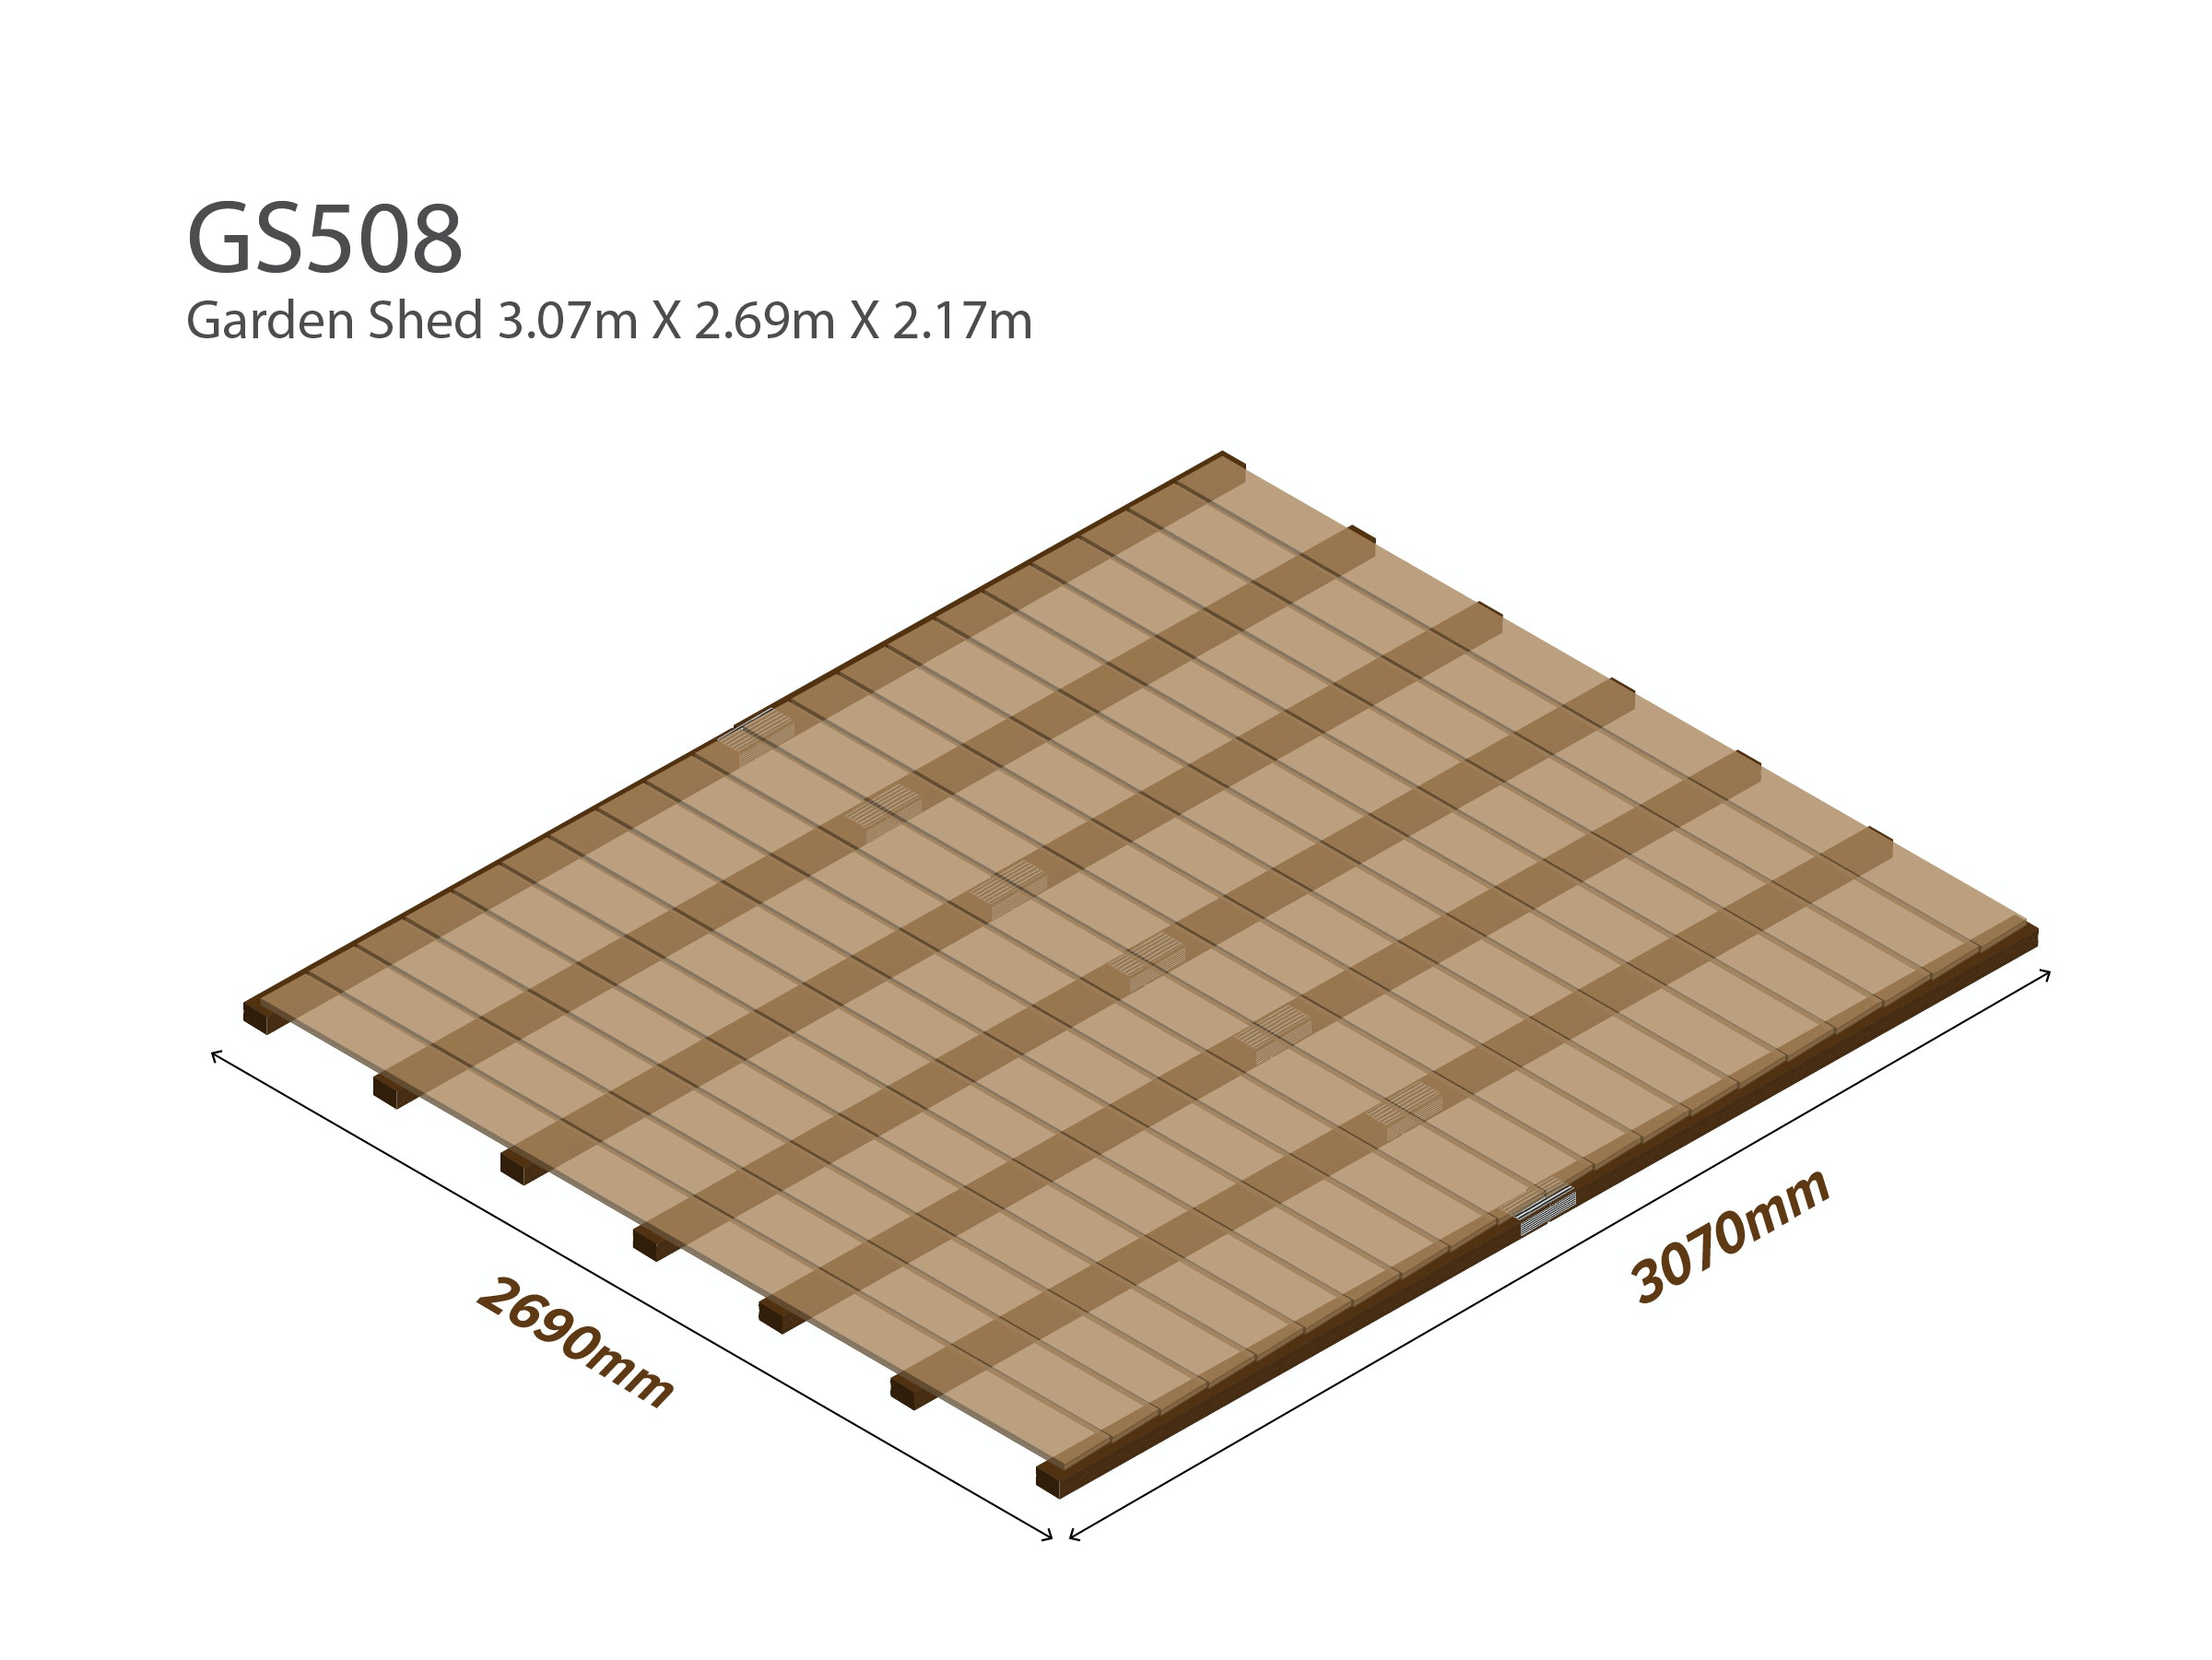 Garden Shed Wooden Floor Kit 3.07m x 2.69m